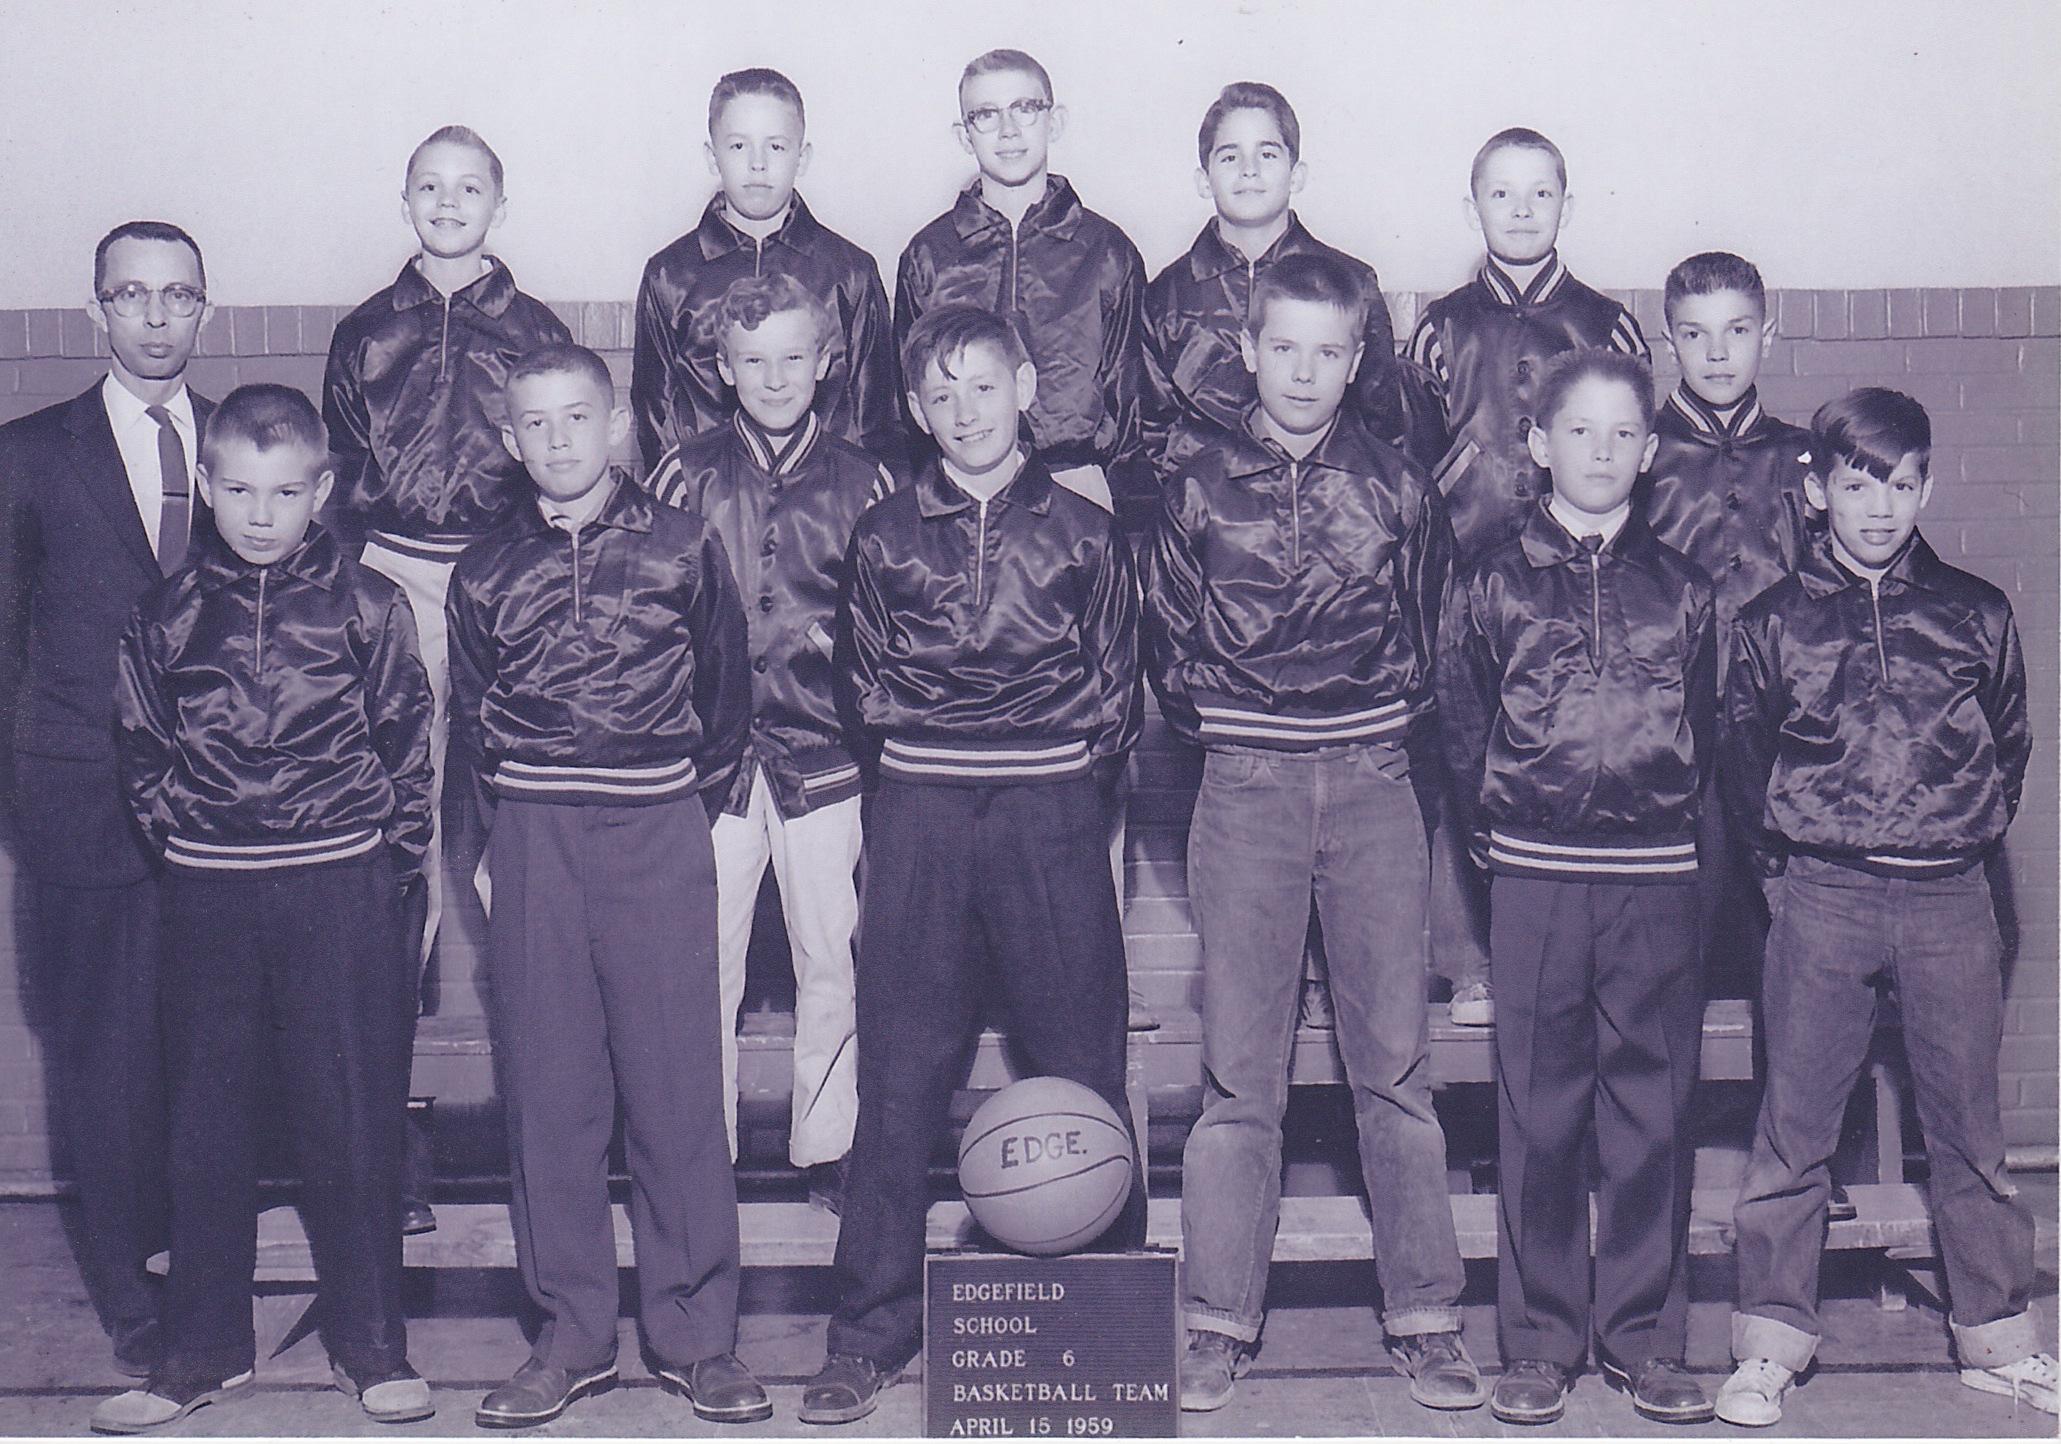 Edgefield School, basketball team